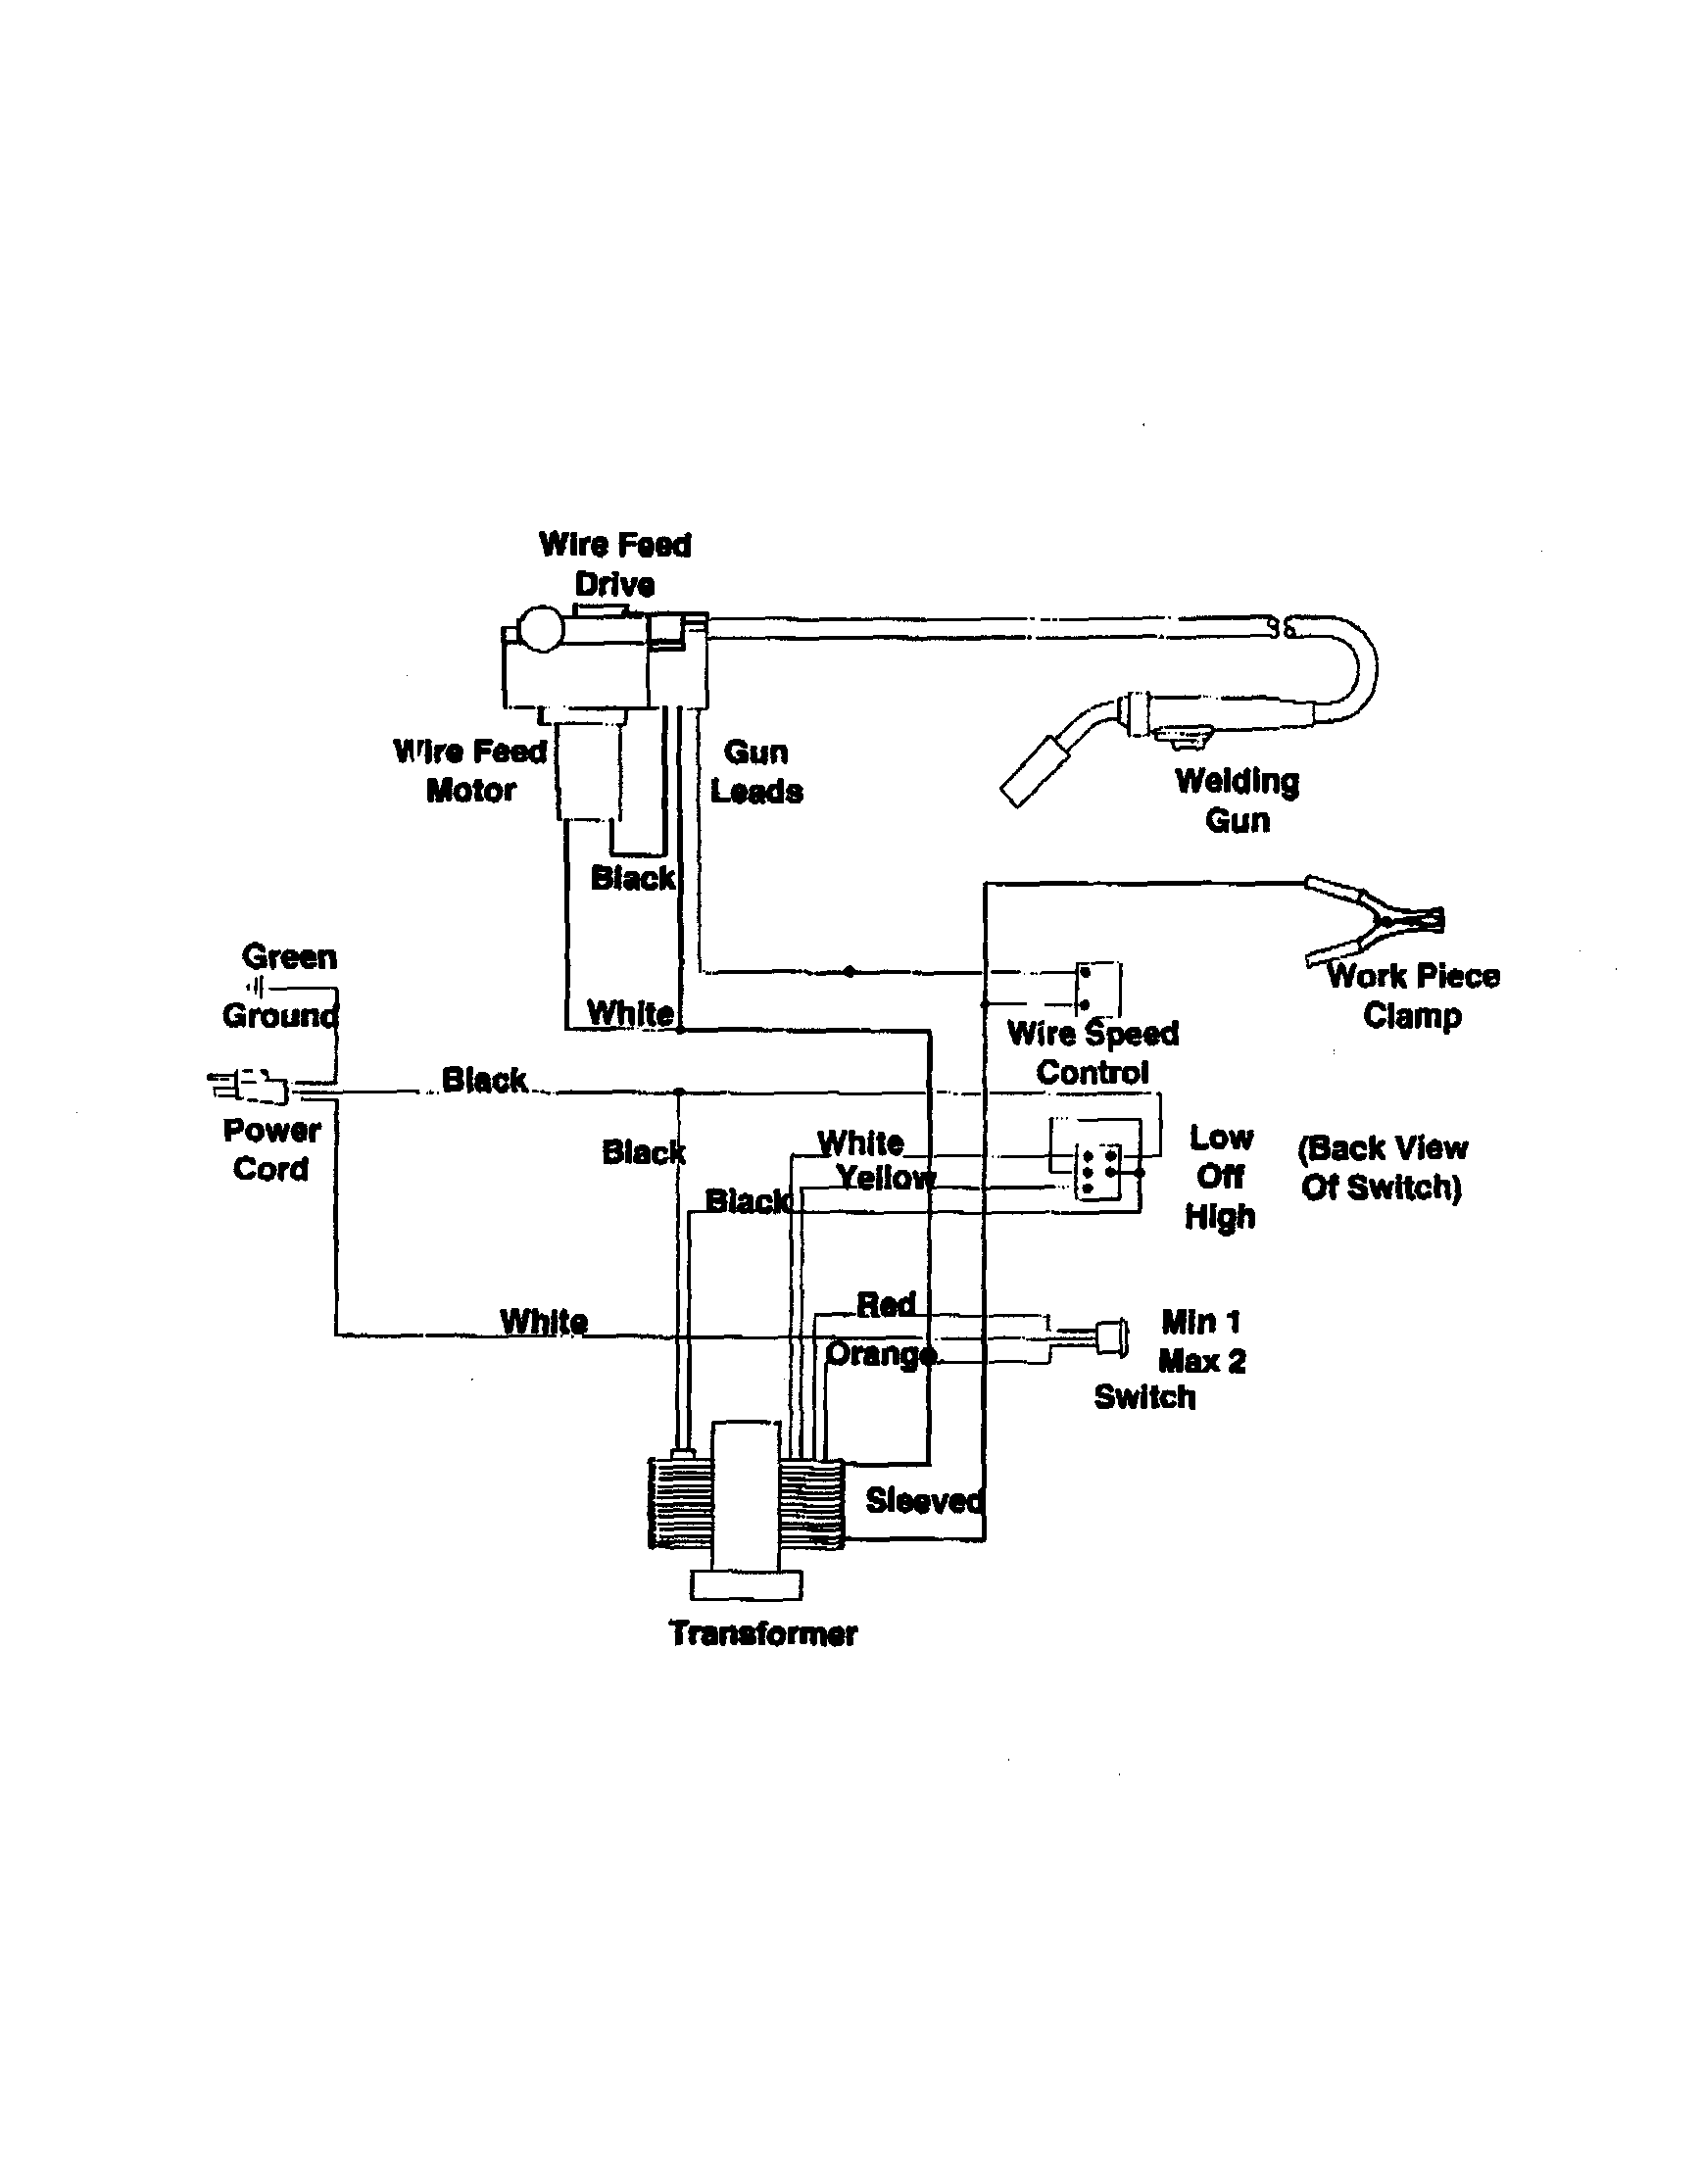 schematic diagram jvc av 32d305 color tv